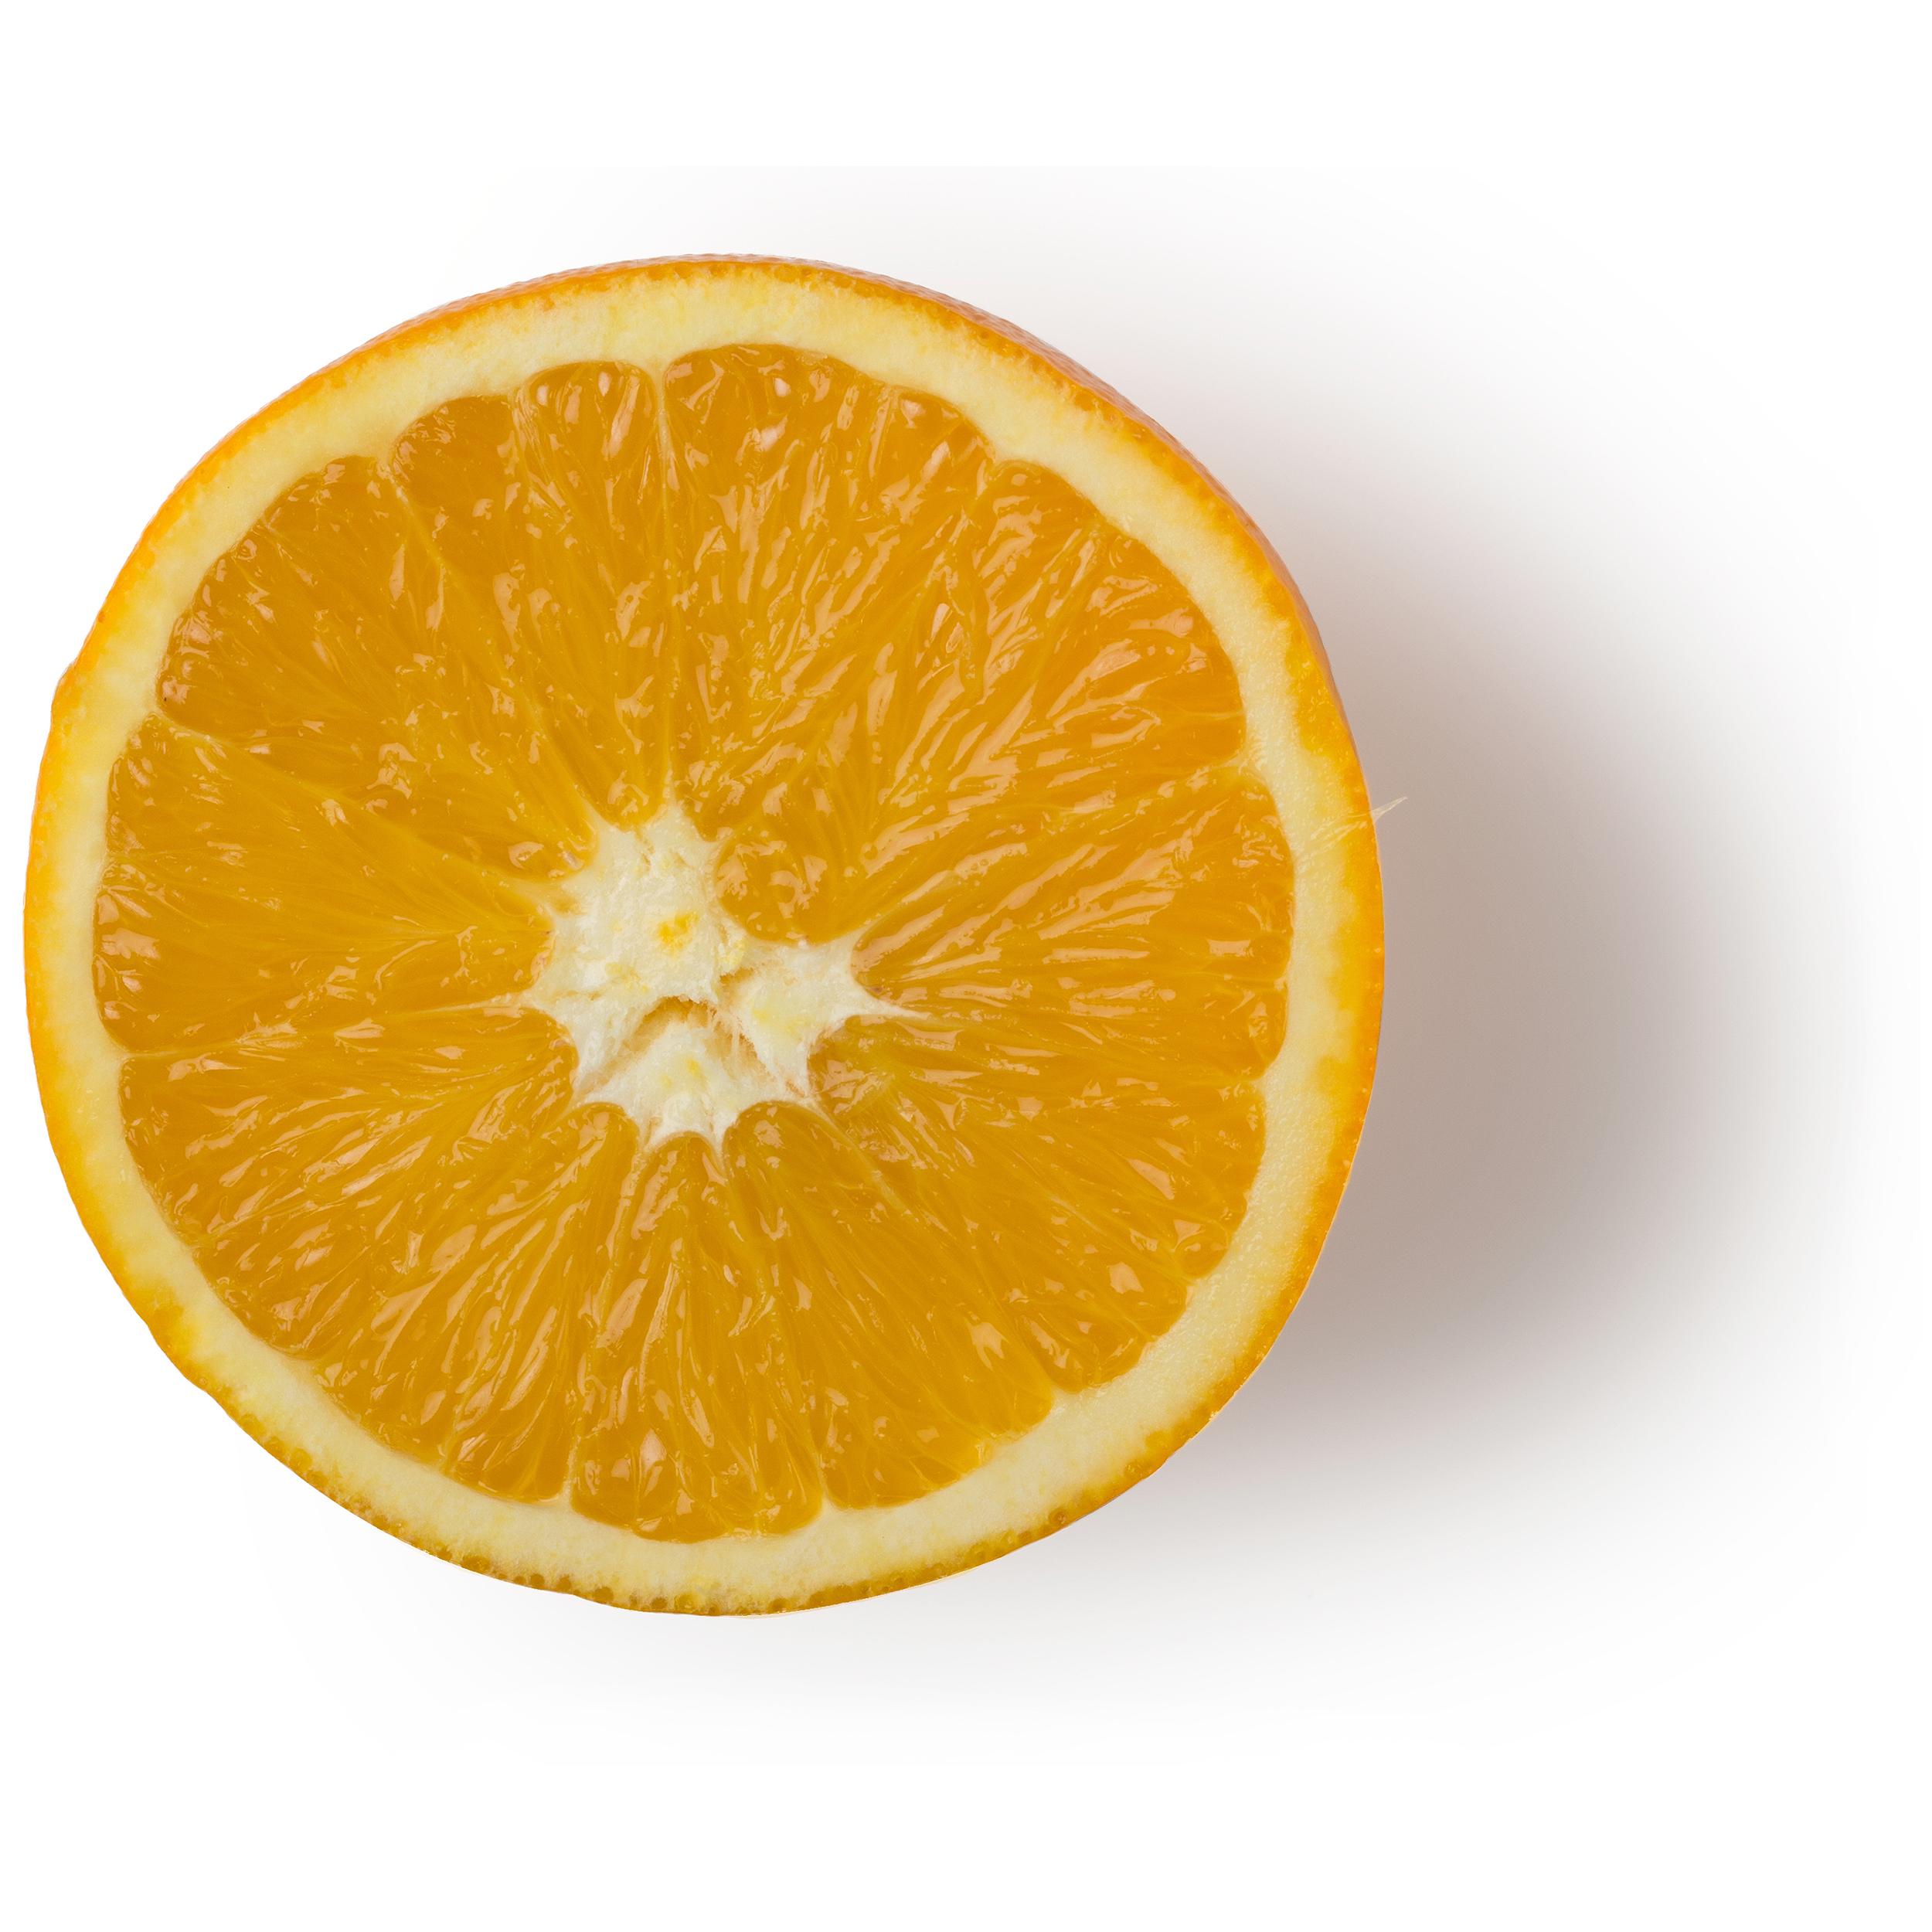 Olio Essenziale di Arancia Dolce (Citrus sinensis)